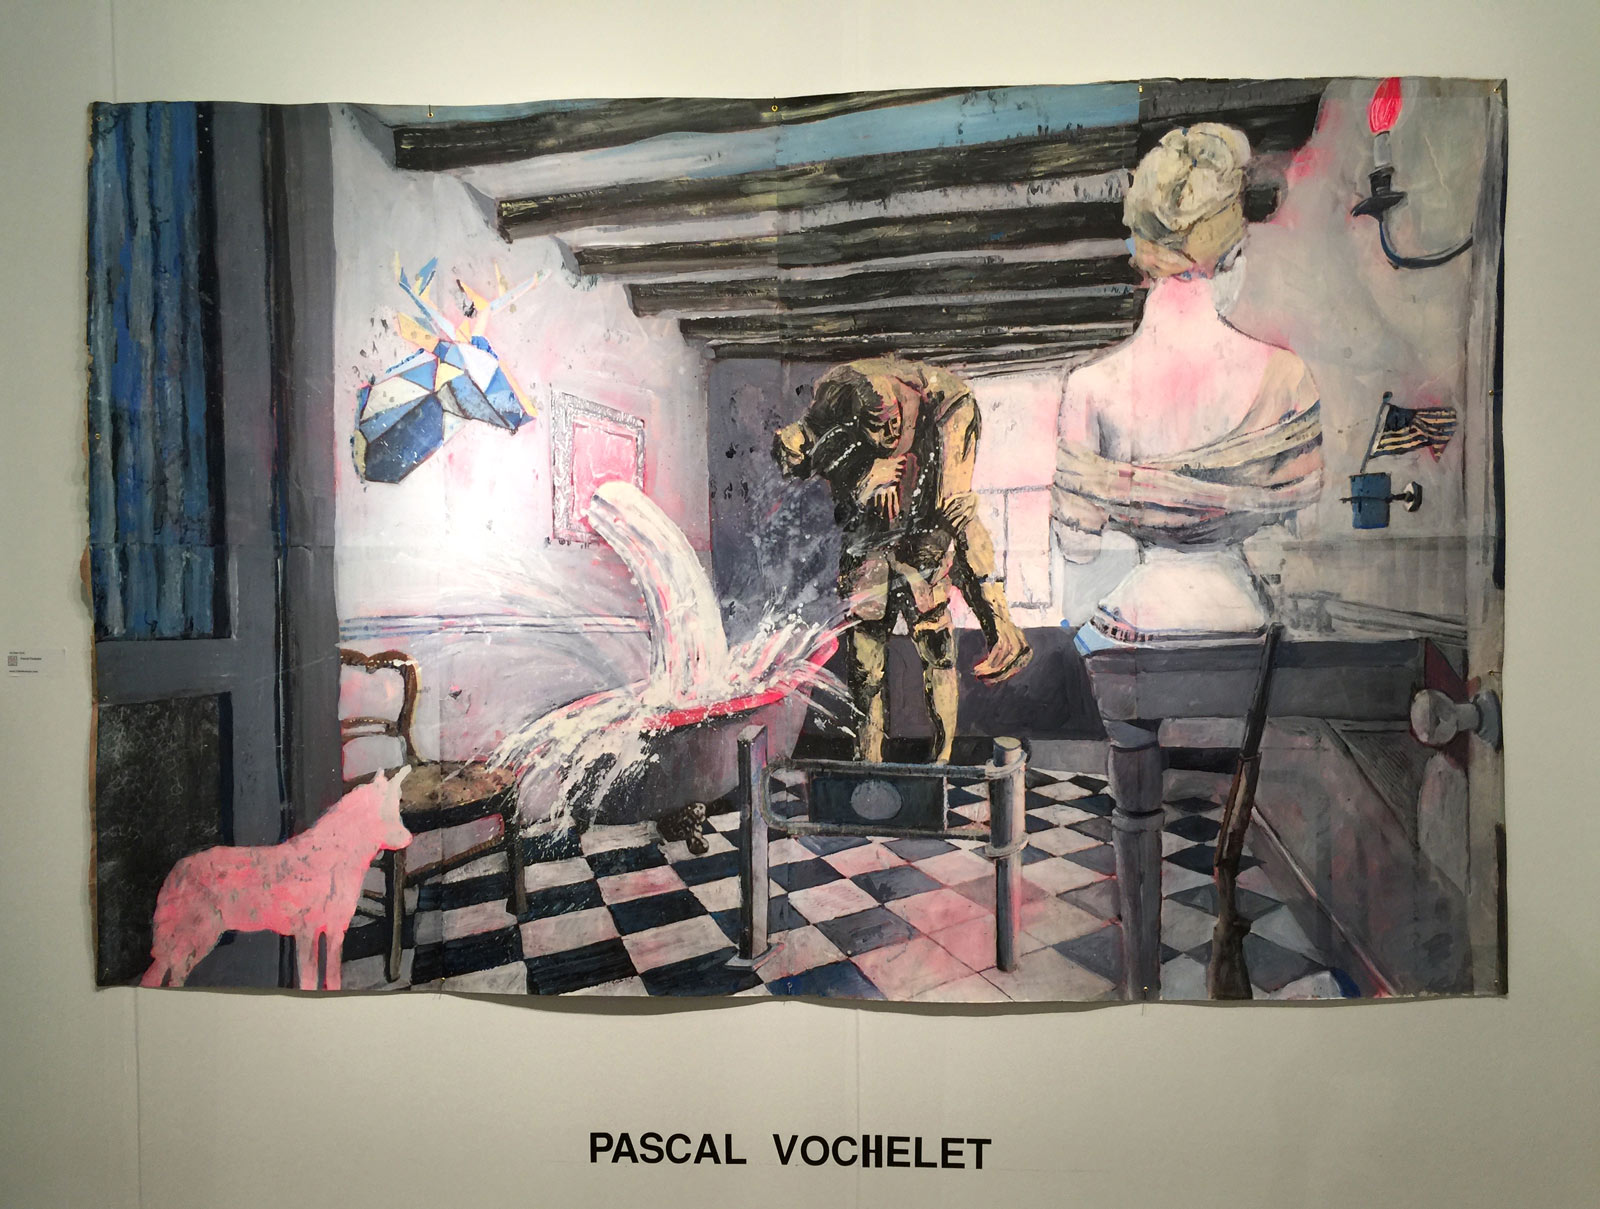 Pascal-Vochelet-Painting-55-Bellechasse.jpg